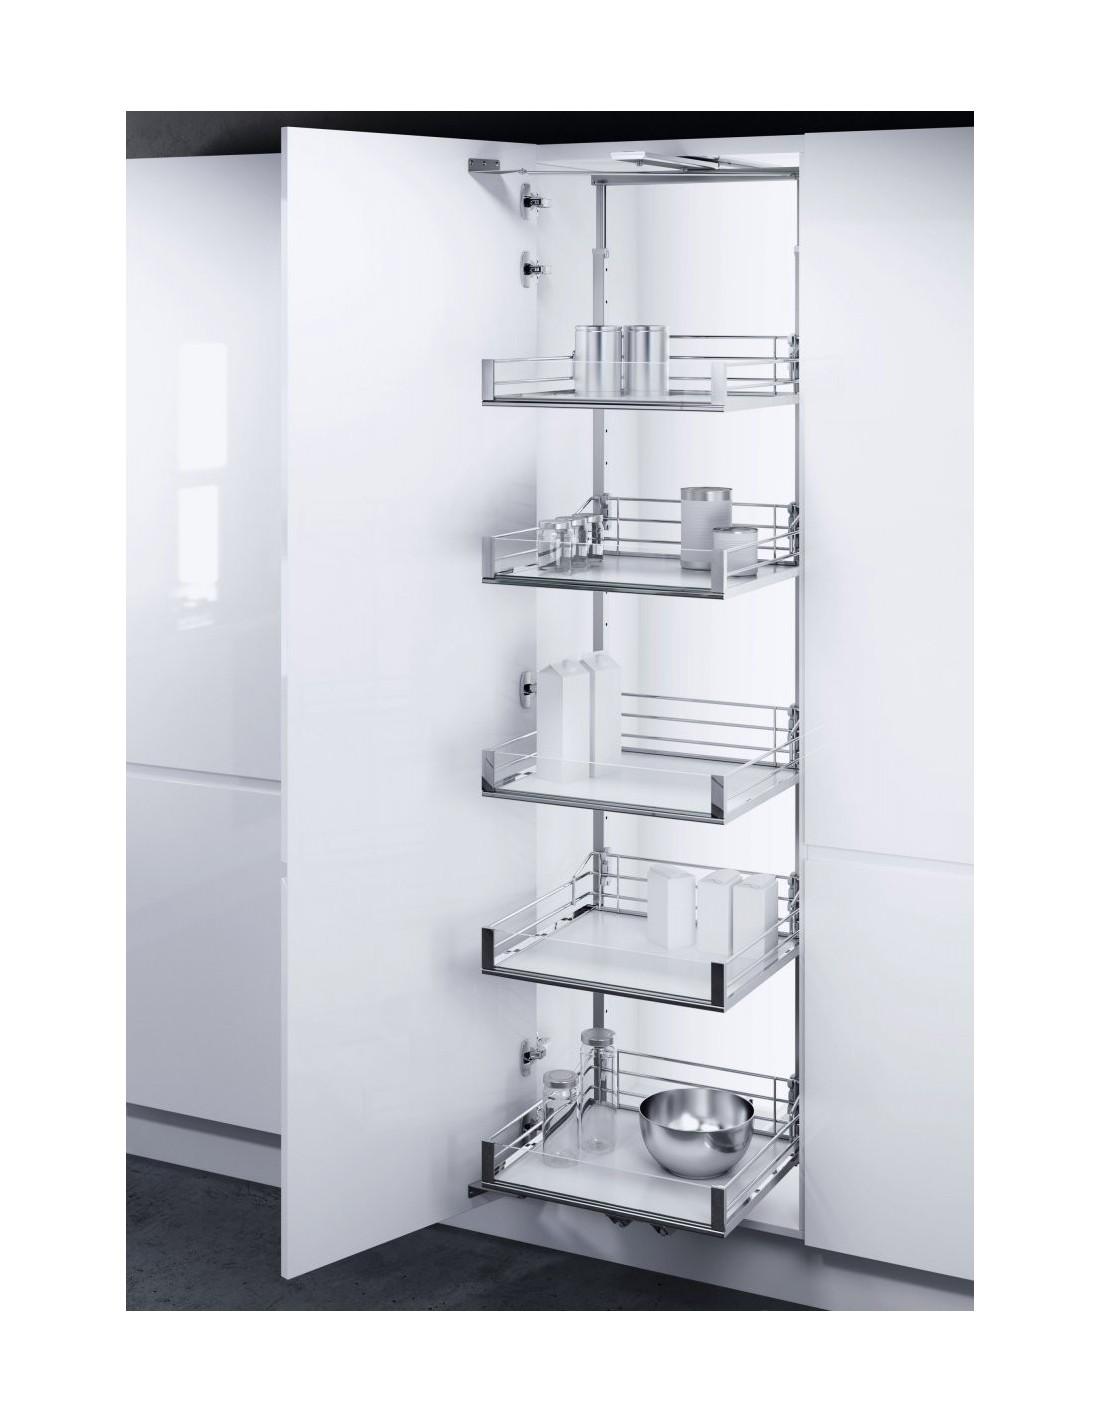 600mm vauth sagel larder unit complete set quality for 600mm tall kitchen unit